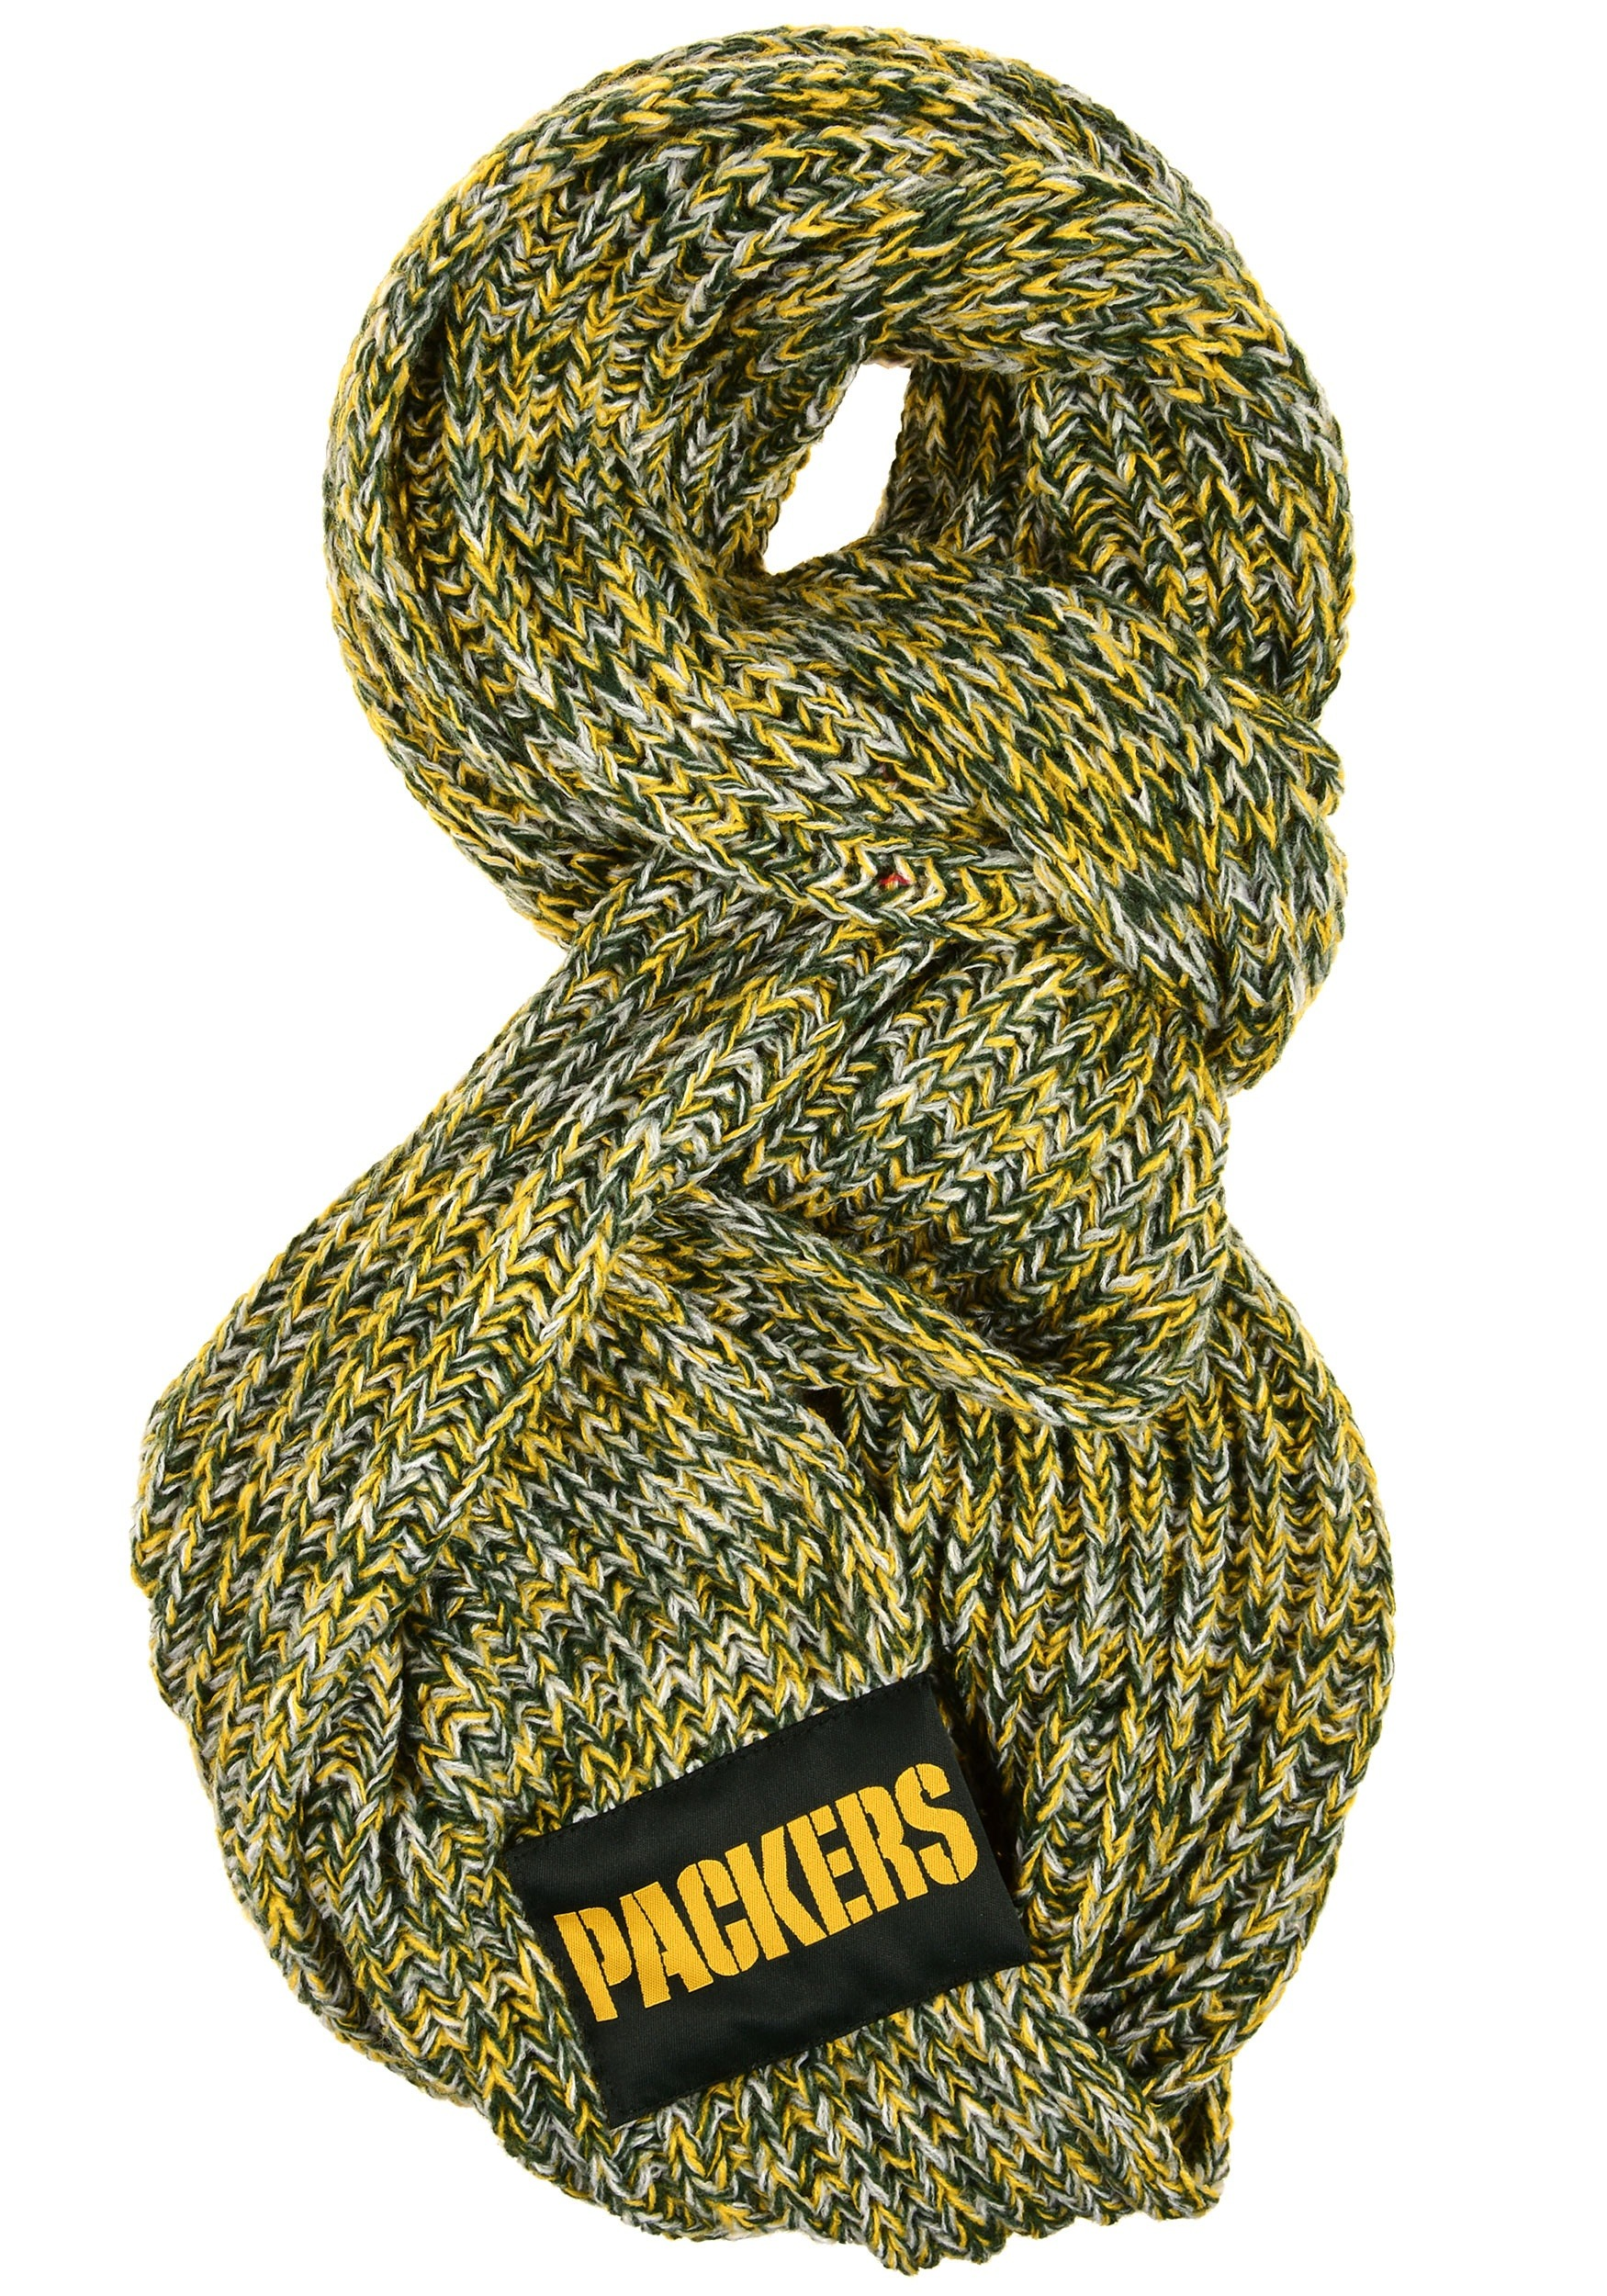 15fce4b796118 Green Bay Packers Peak Infinity Scarf